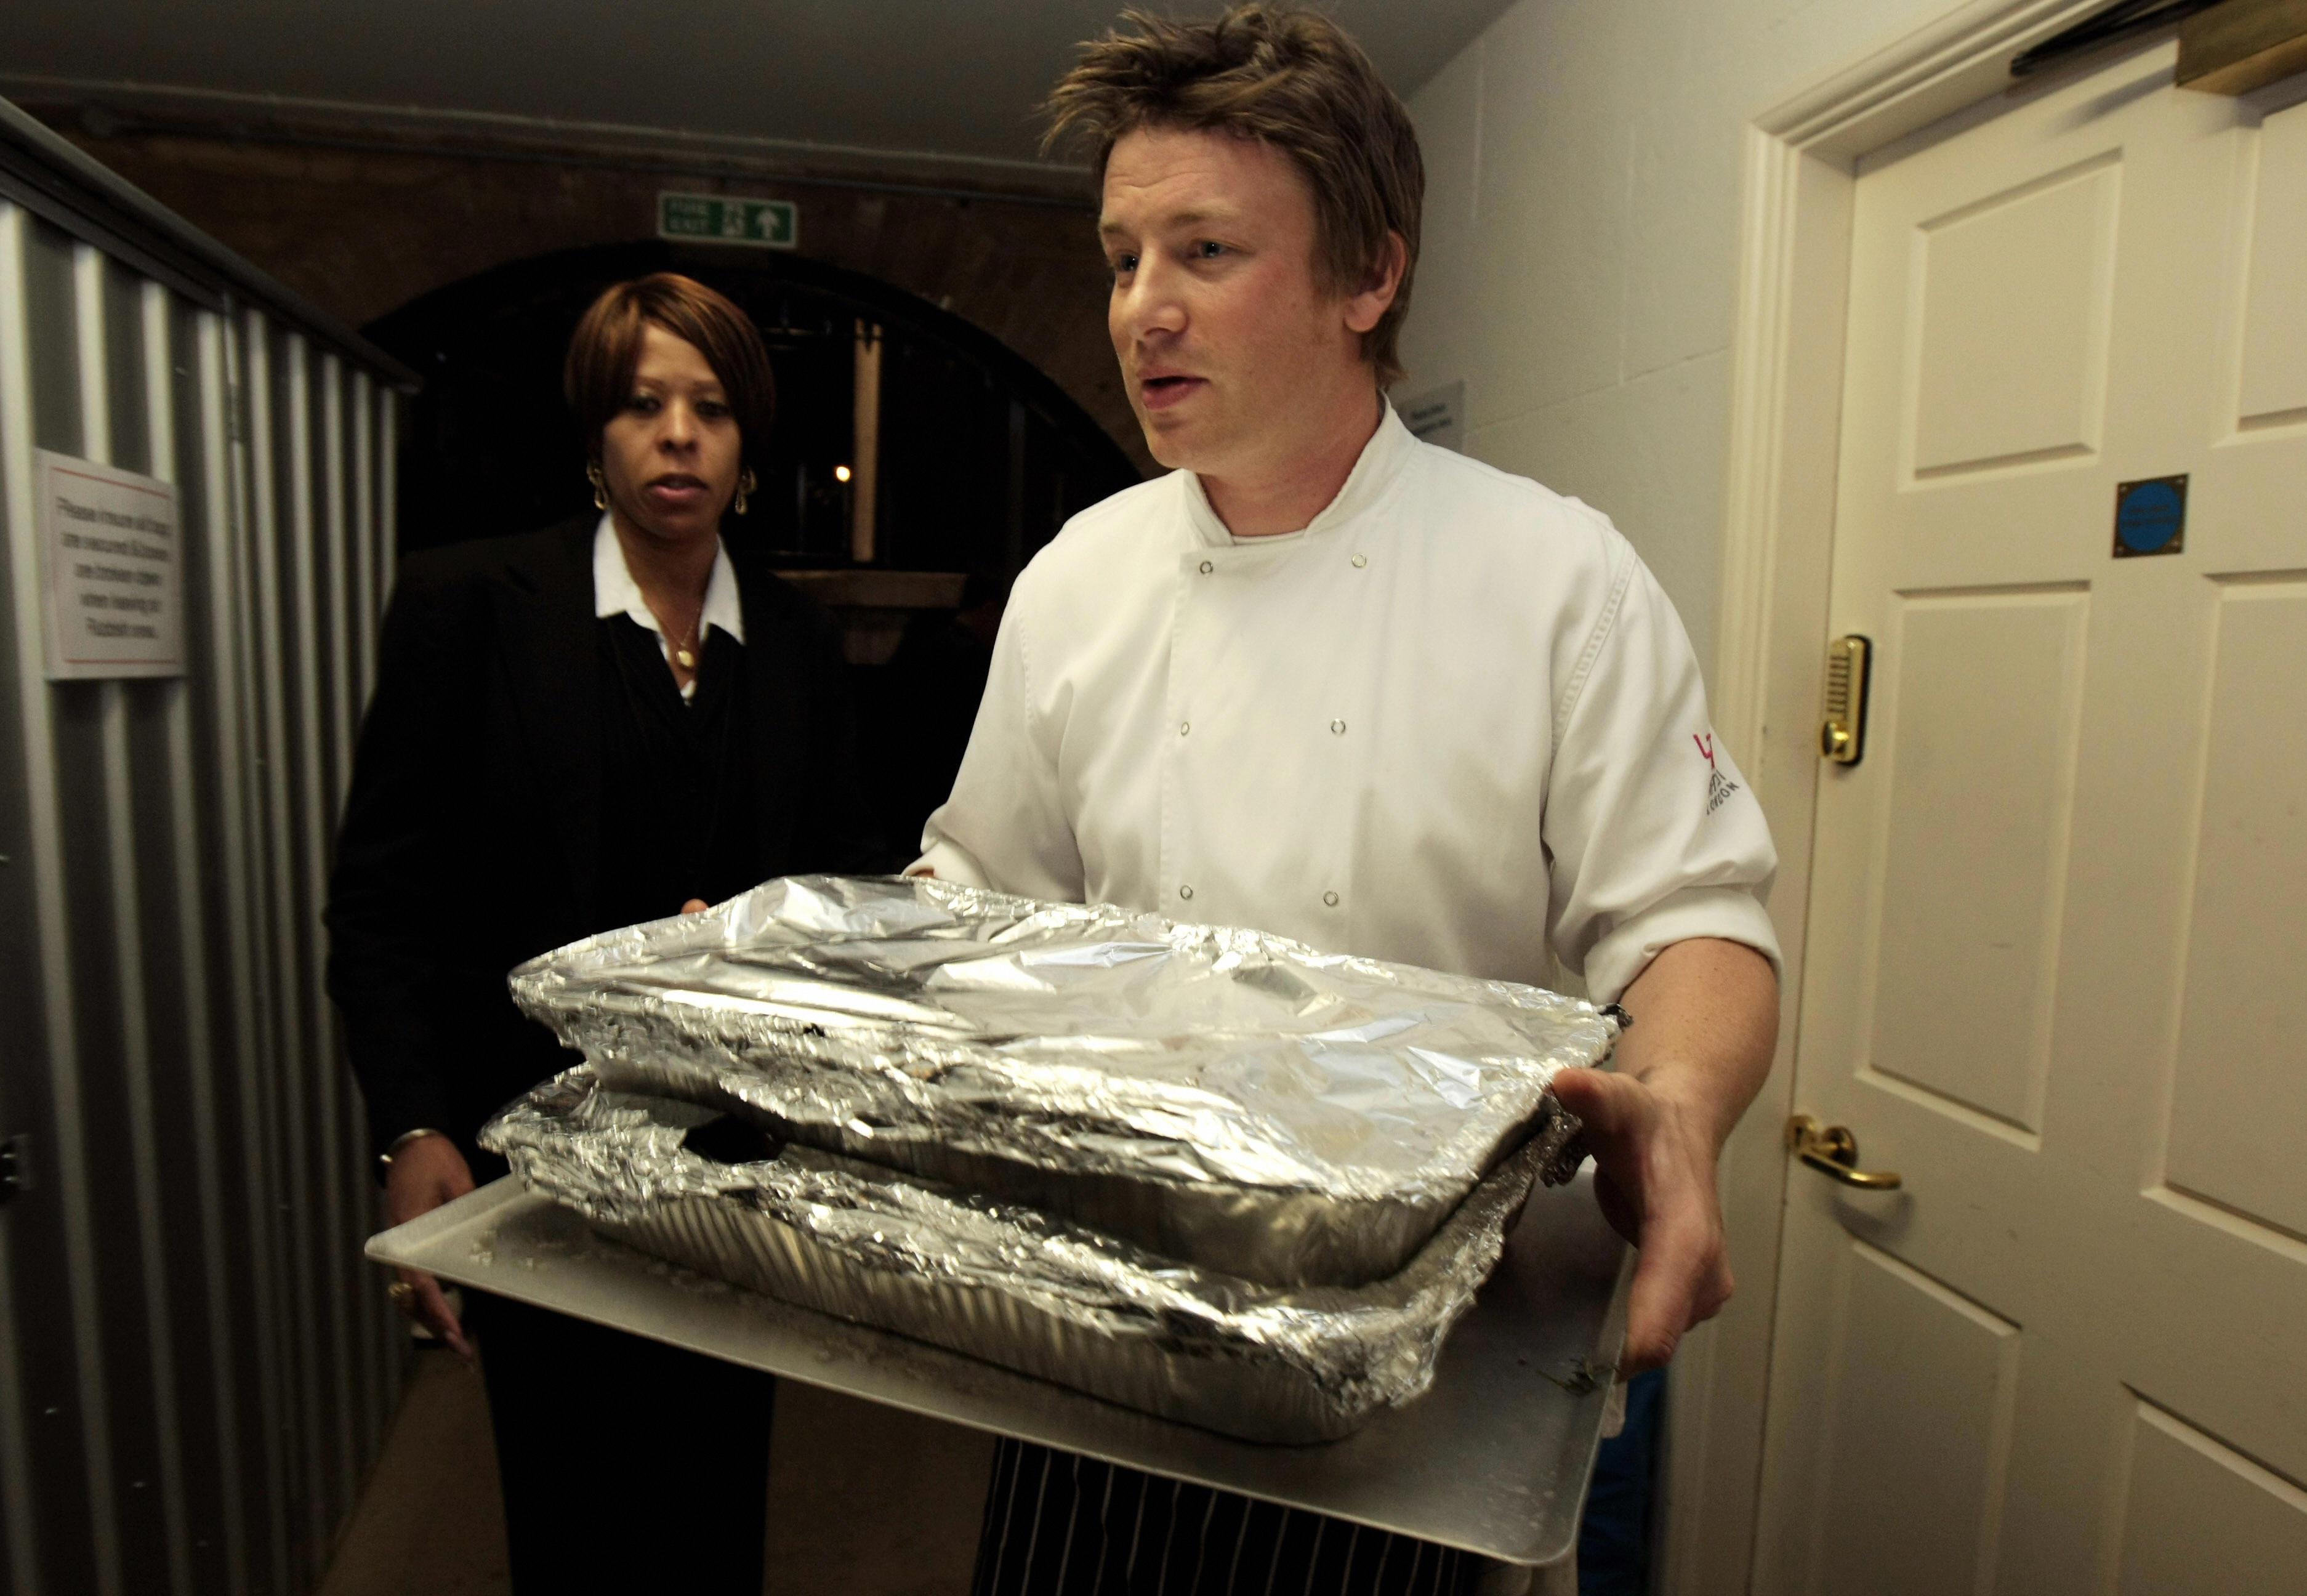 British celebrity Chef Jamie Oliver carries food